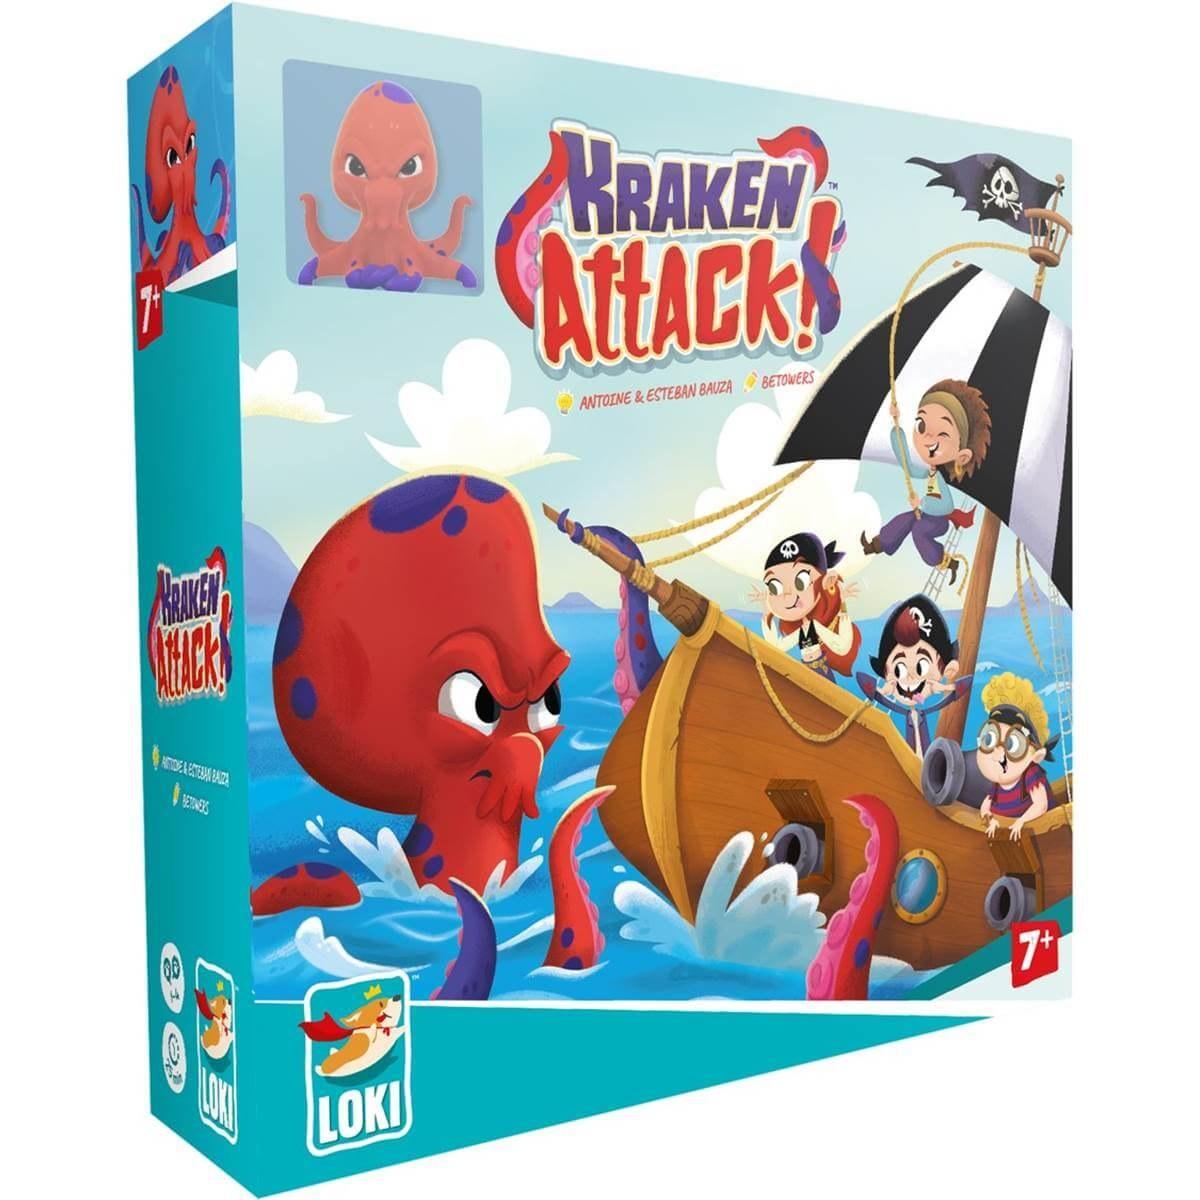 Kraken Attack (fr)